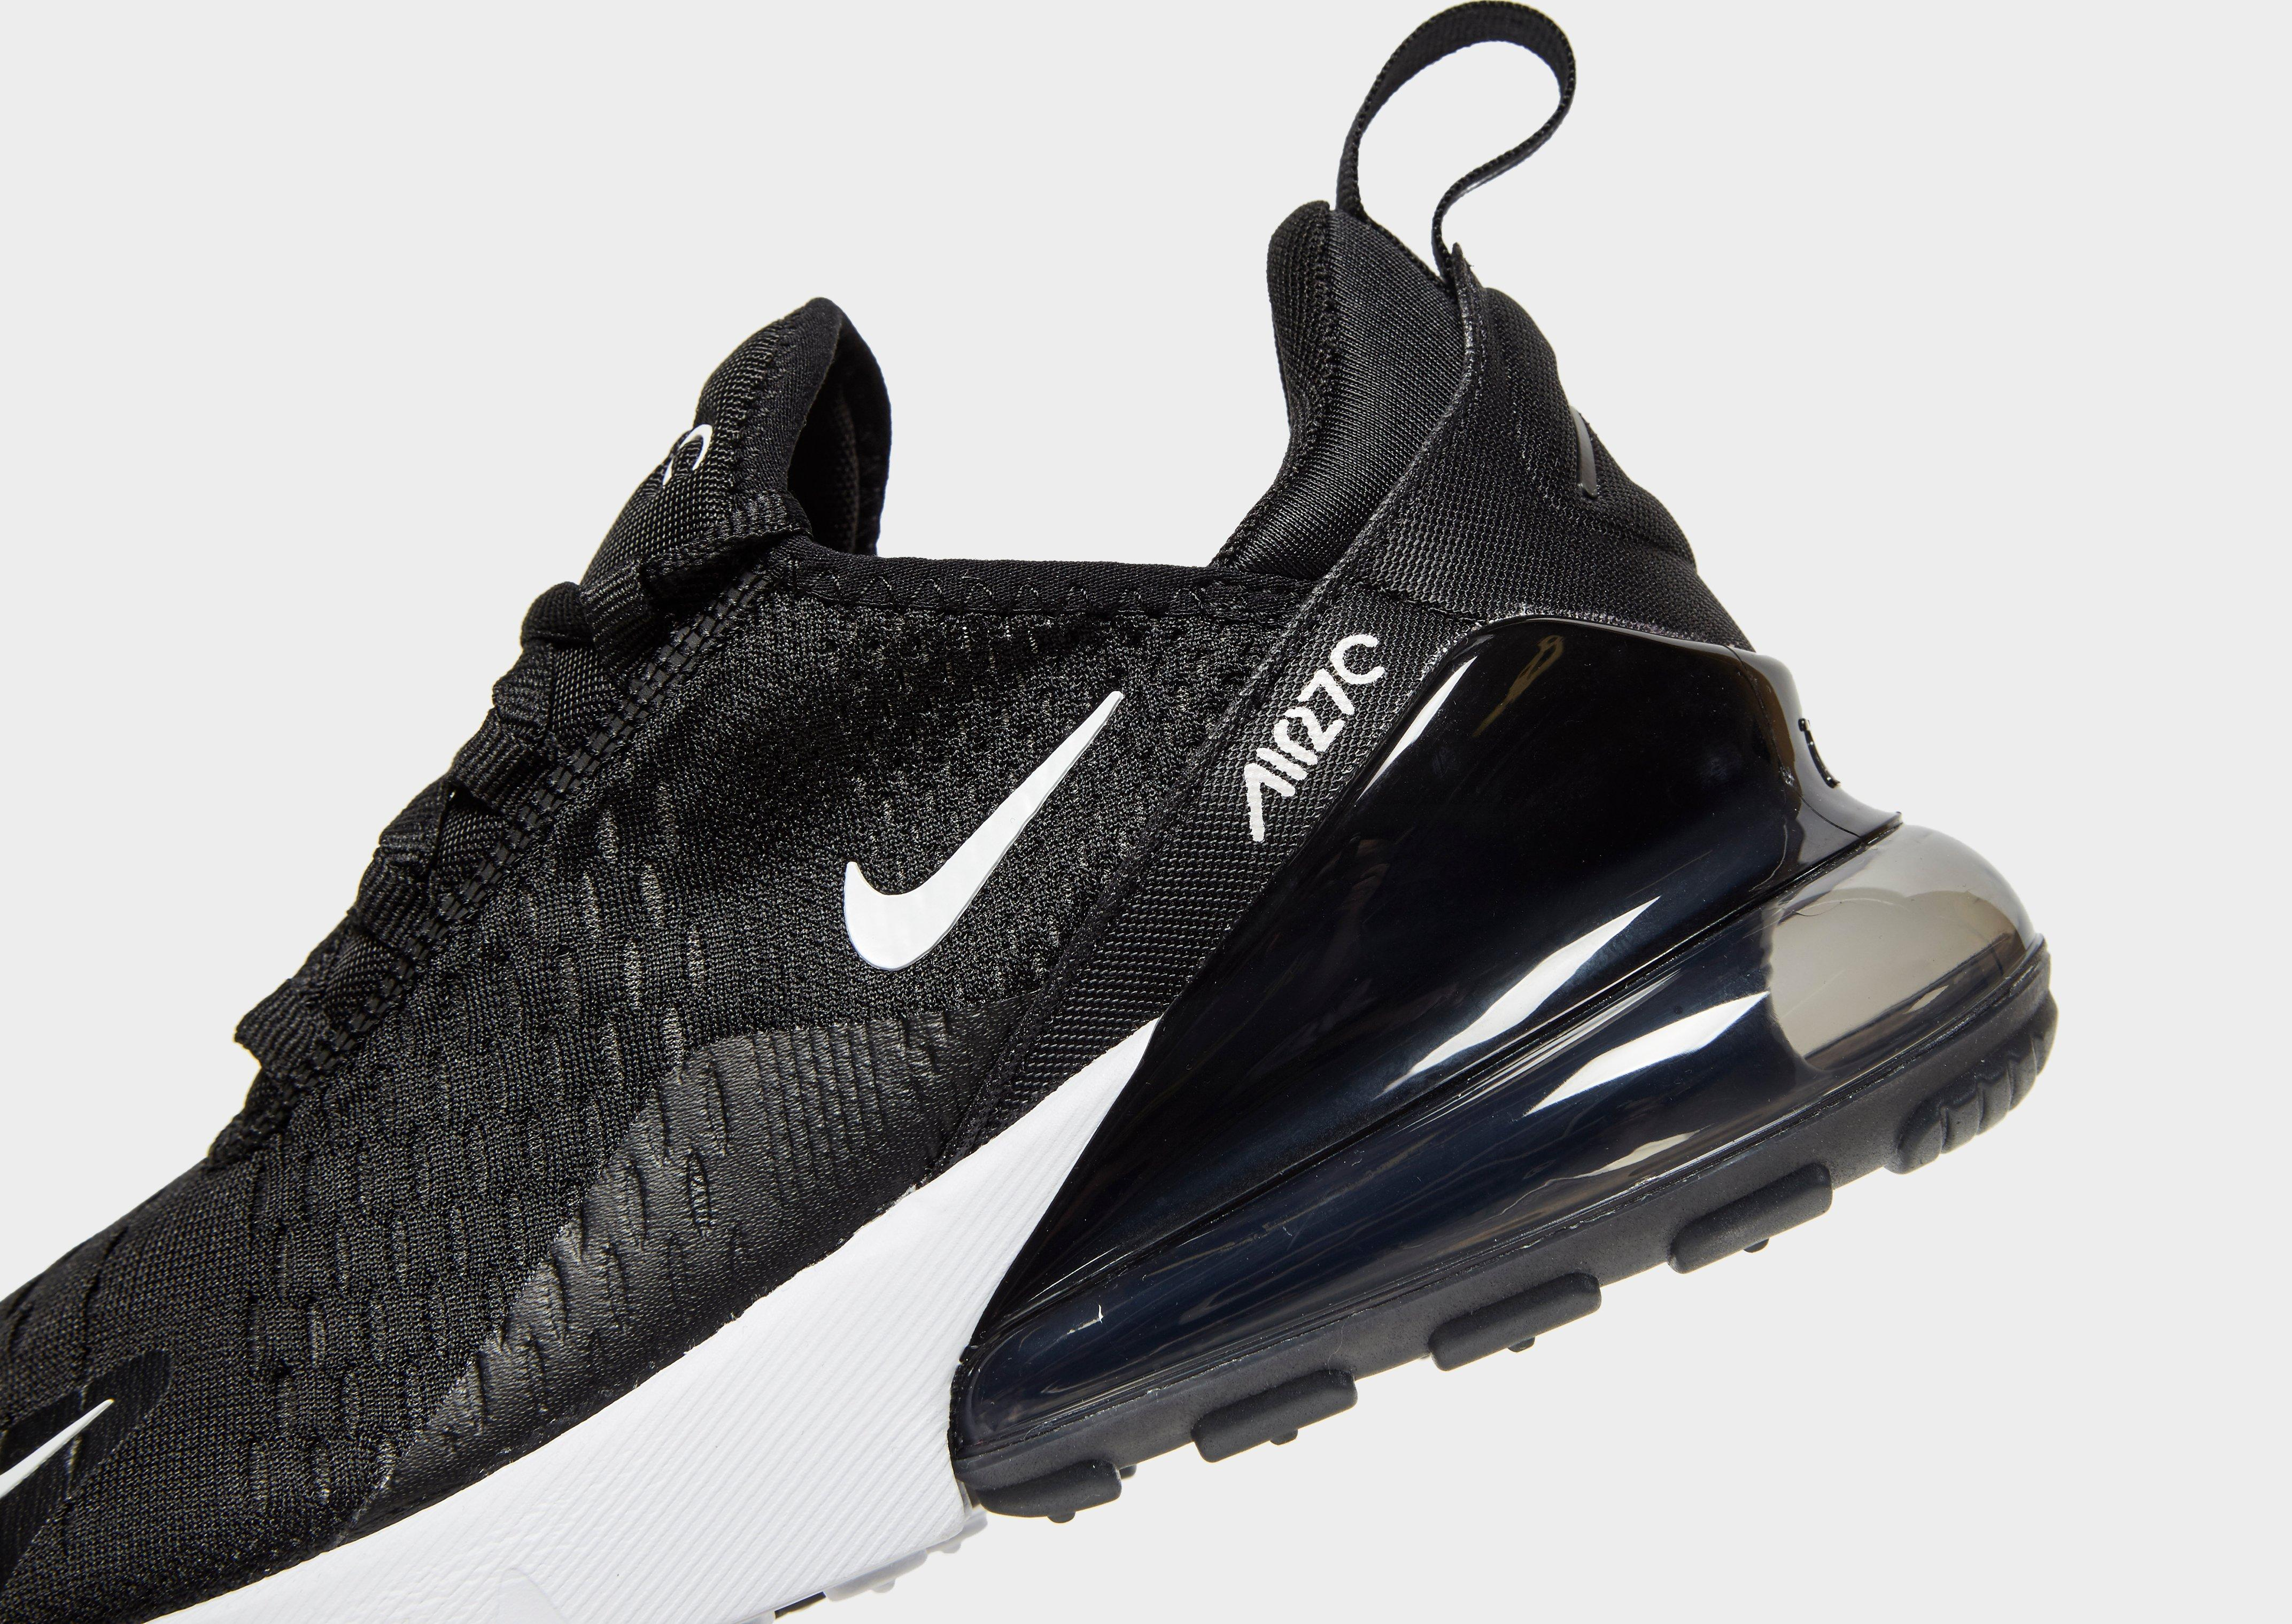 nike air max 270 dames zwart schoenen off 65% trinovo.se